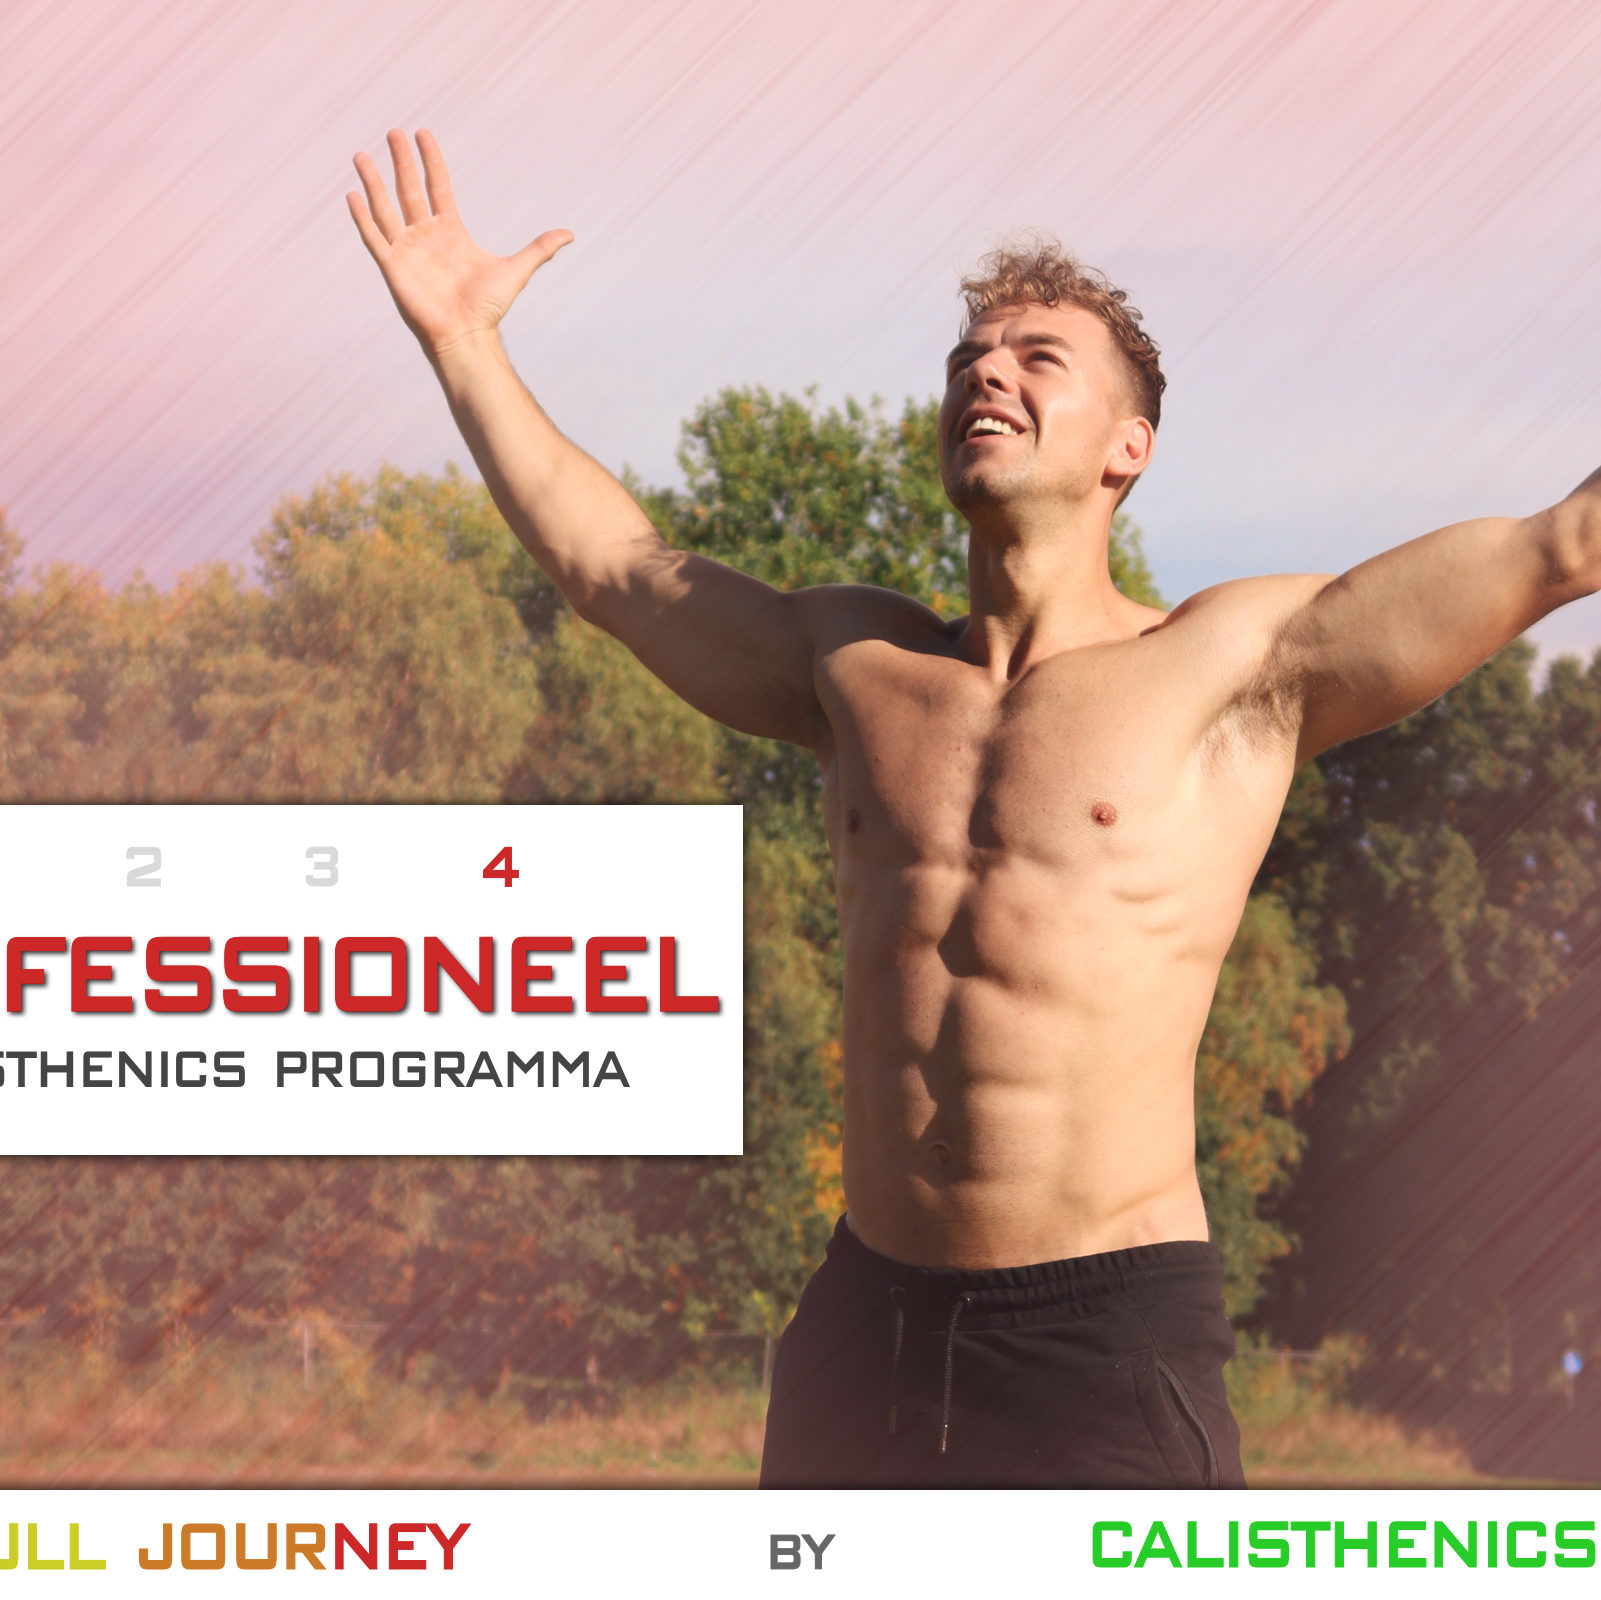 Professioneel Calisthenics Workout Programma